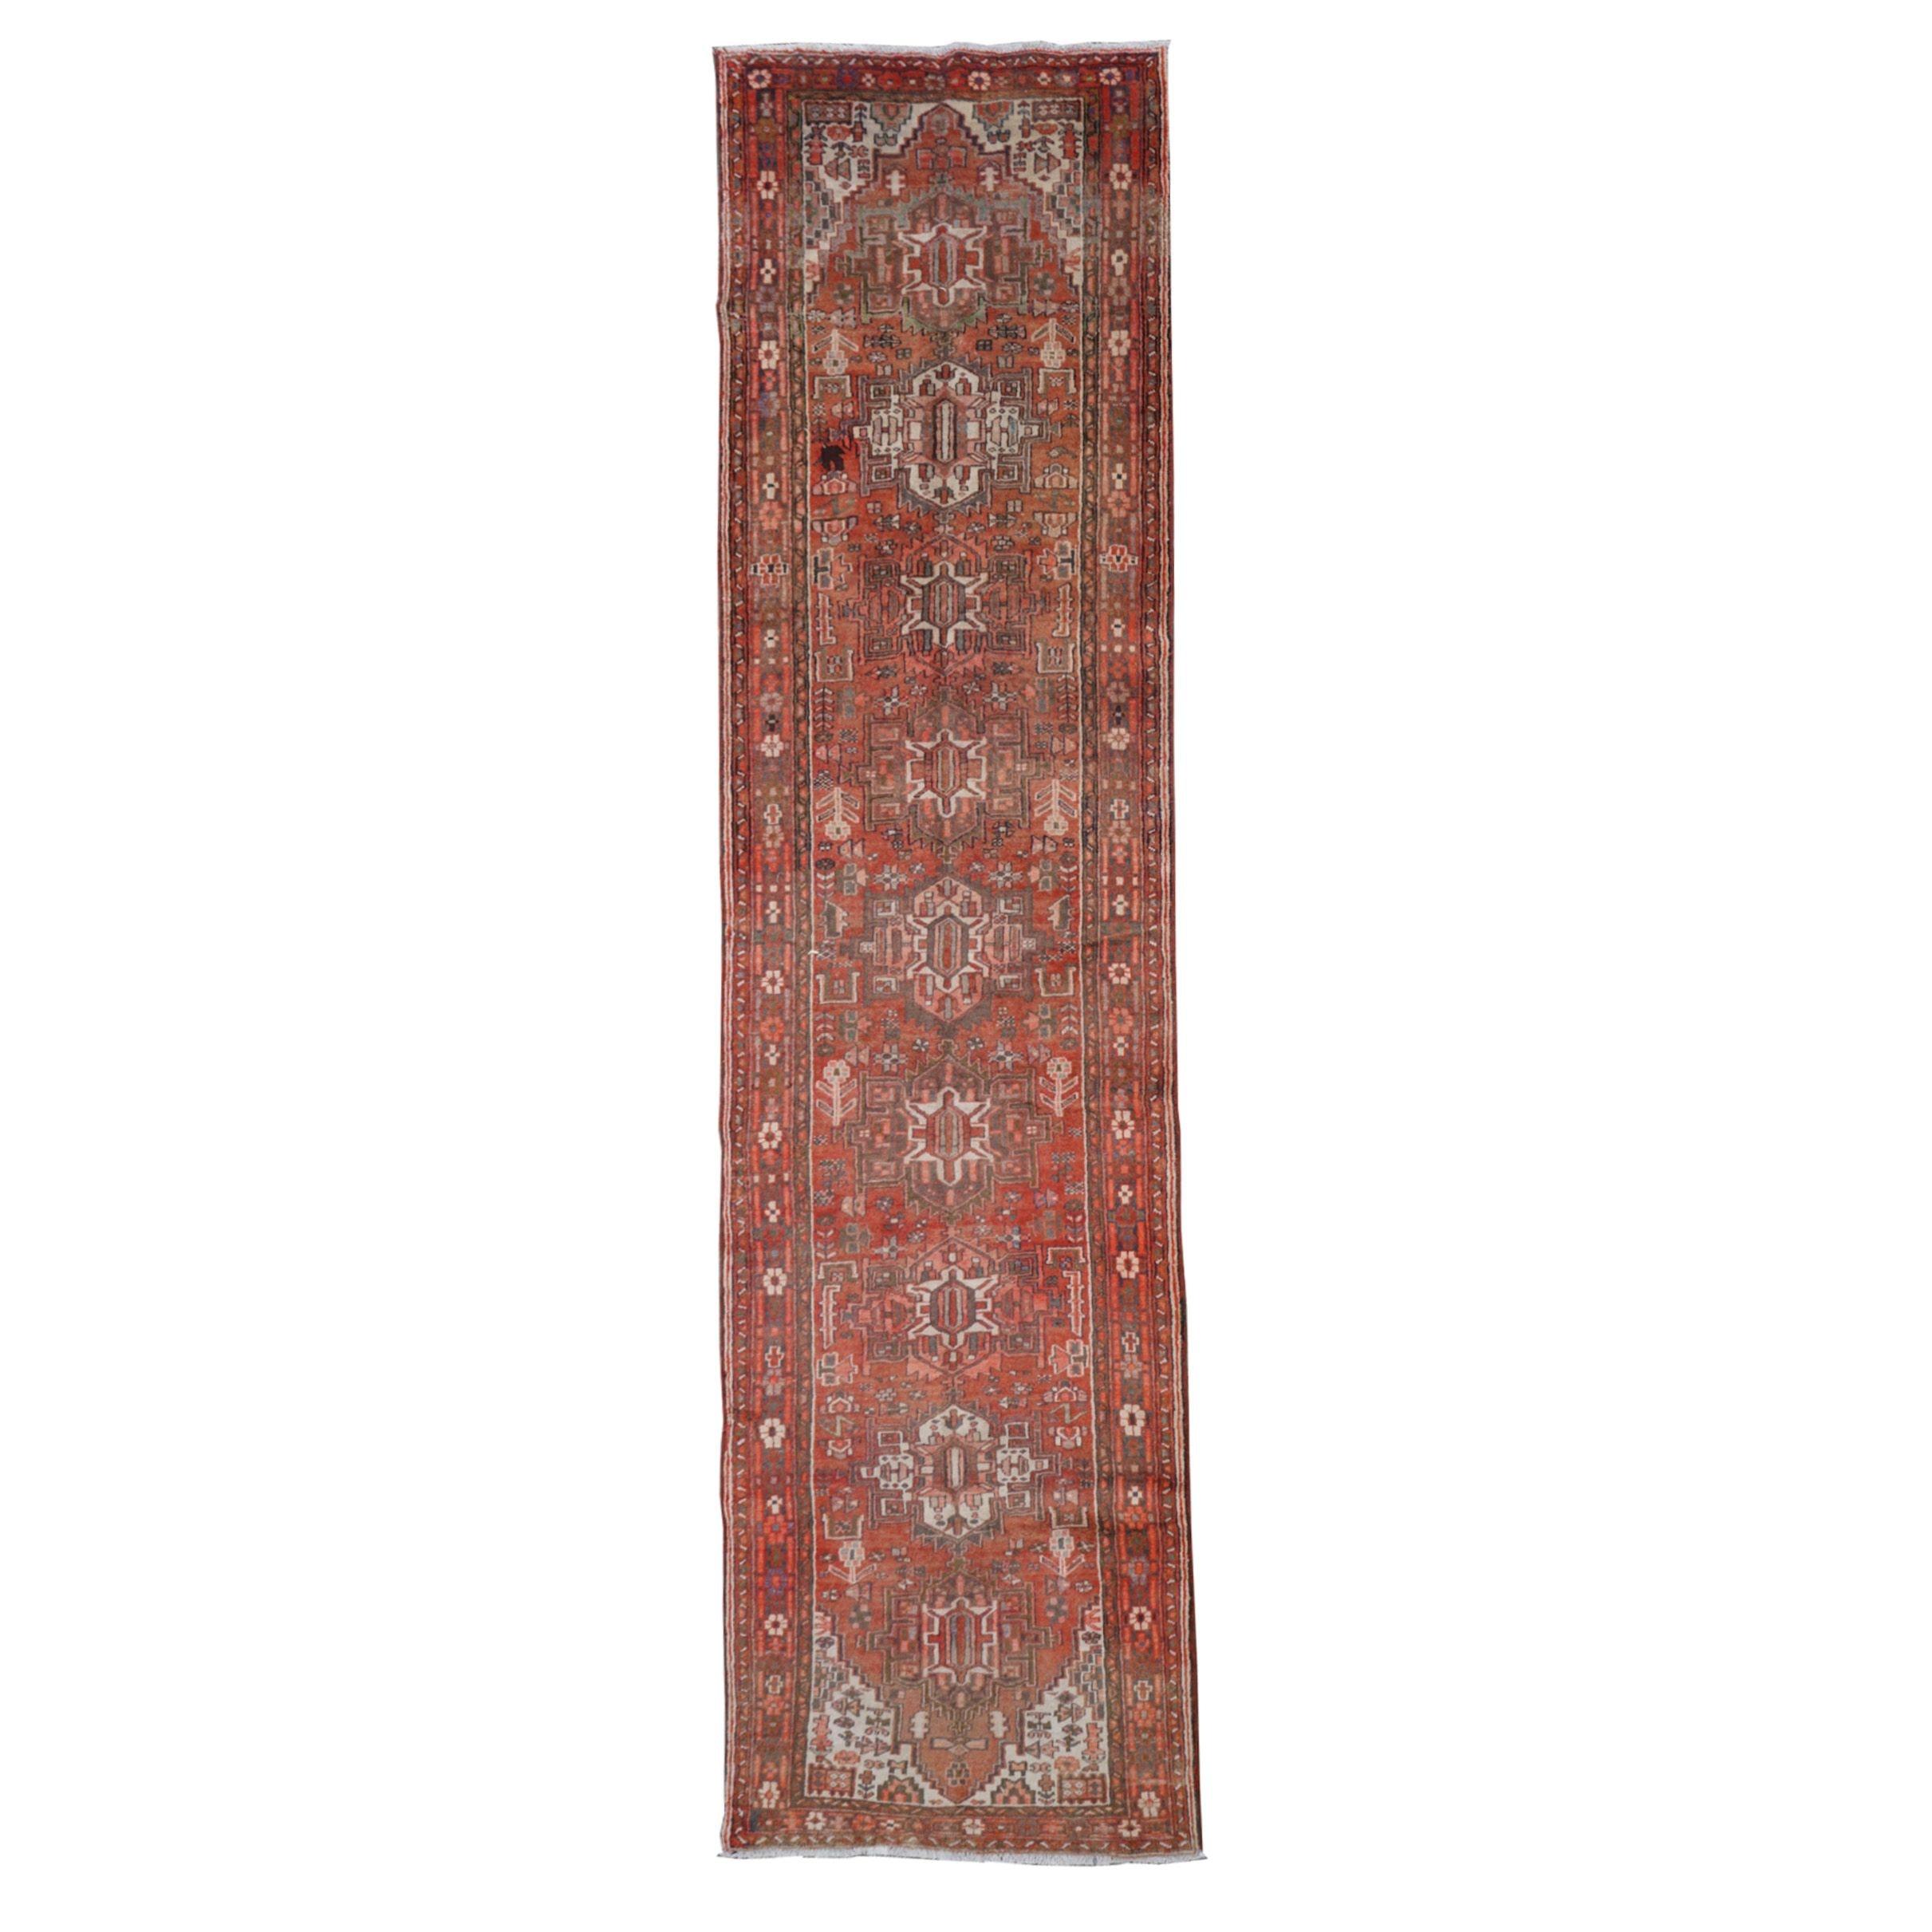 Hand-Knotted Persian Karaja Wool Carpet Runner